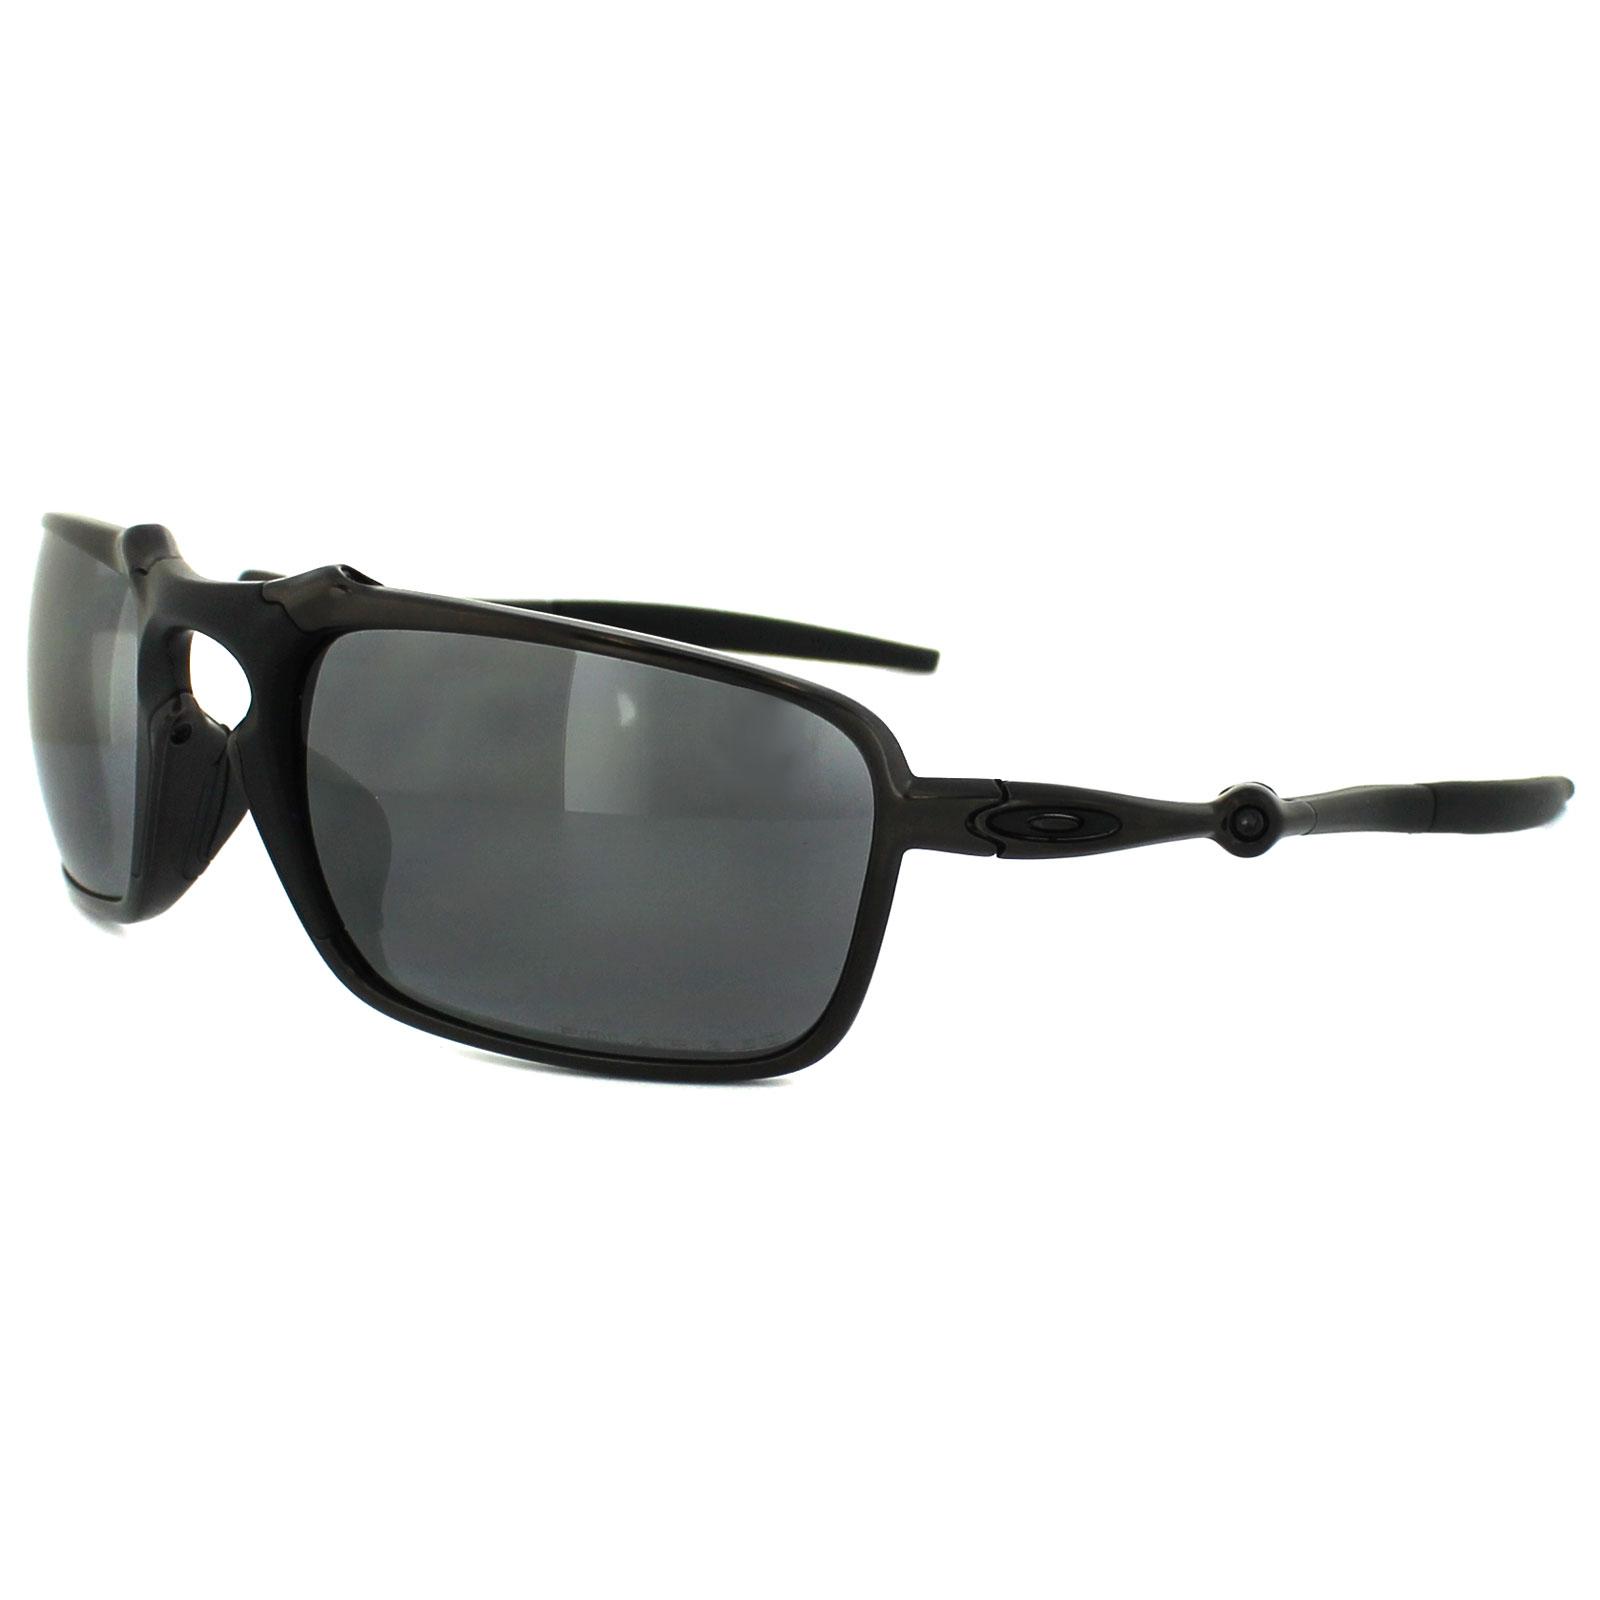 f968040a2e70 Sunglasses For Sale Uk Ebay